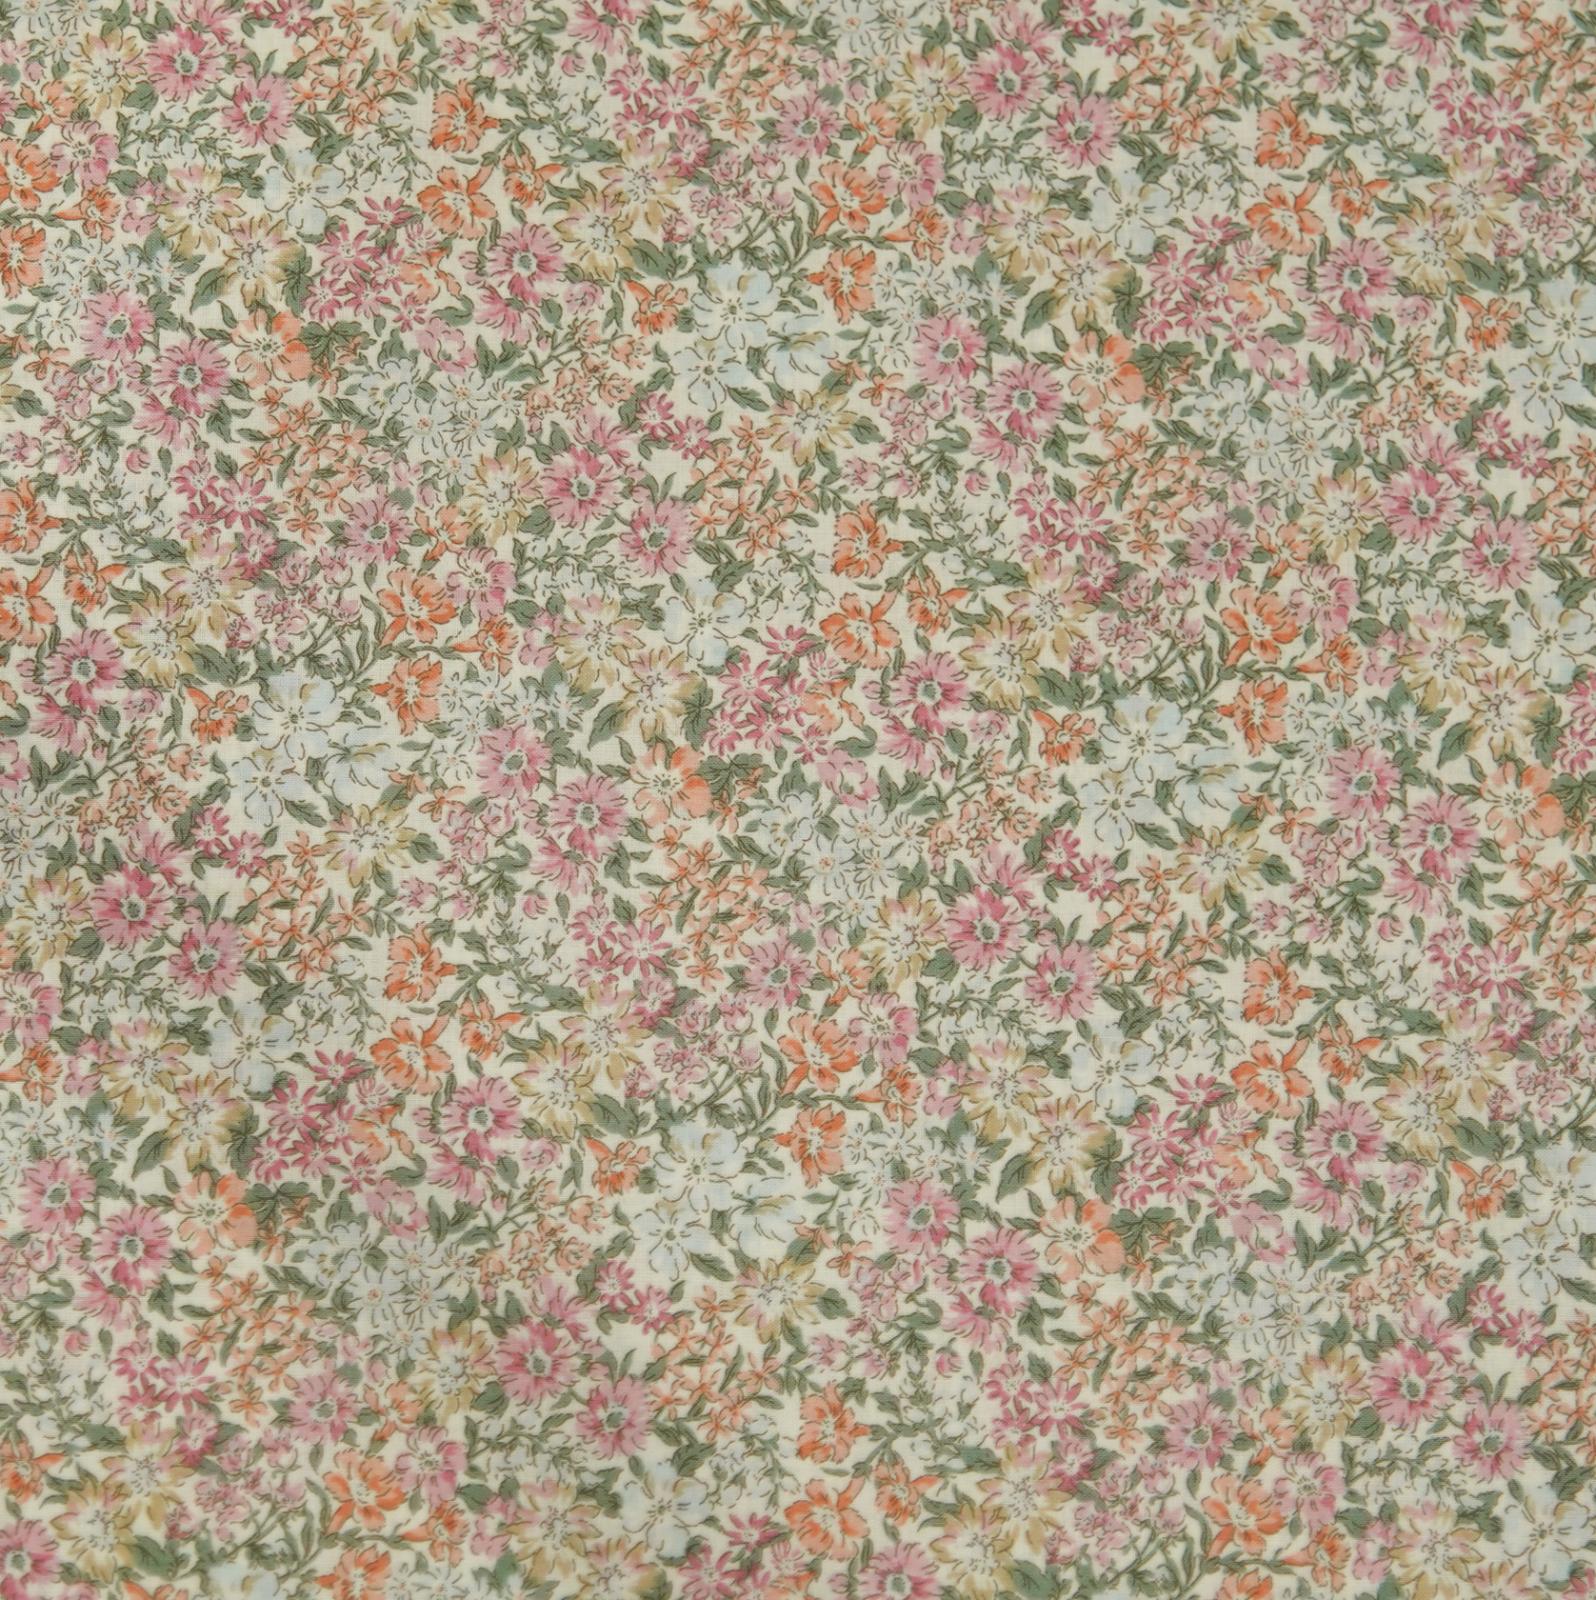 Hokkoh Fabric - Lawn Fabric - Pretty Floral